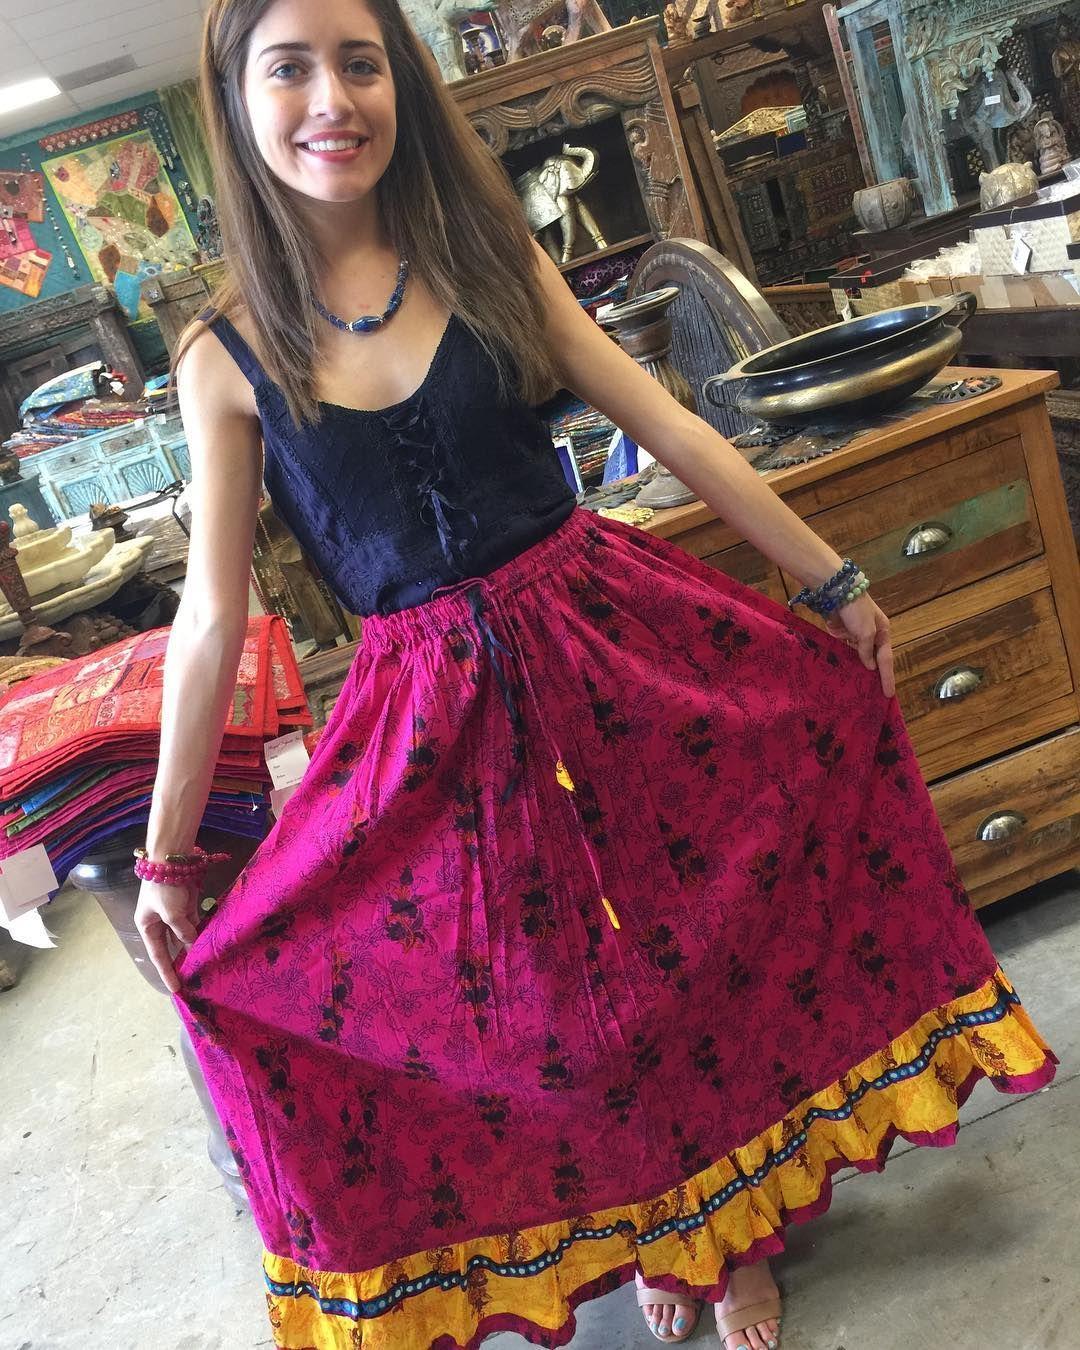 Boho Bohemian Style A-line Long Skirts  #skirt#maxiskirt#longskirt#medievalskirt#bohemianskirt #gypsyskirt#patchworkskirt#festiveskirts#indianskirt #bohemianclothing#giftidea &nbs…